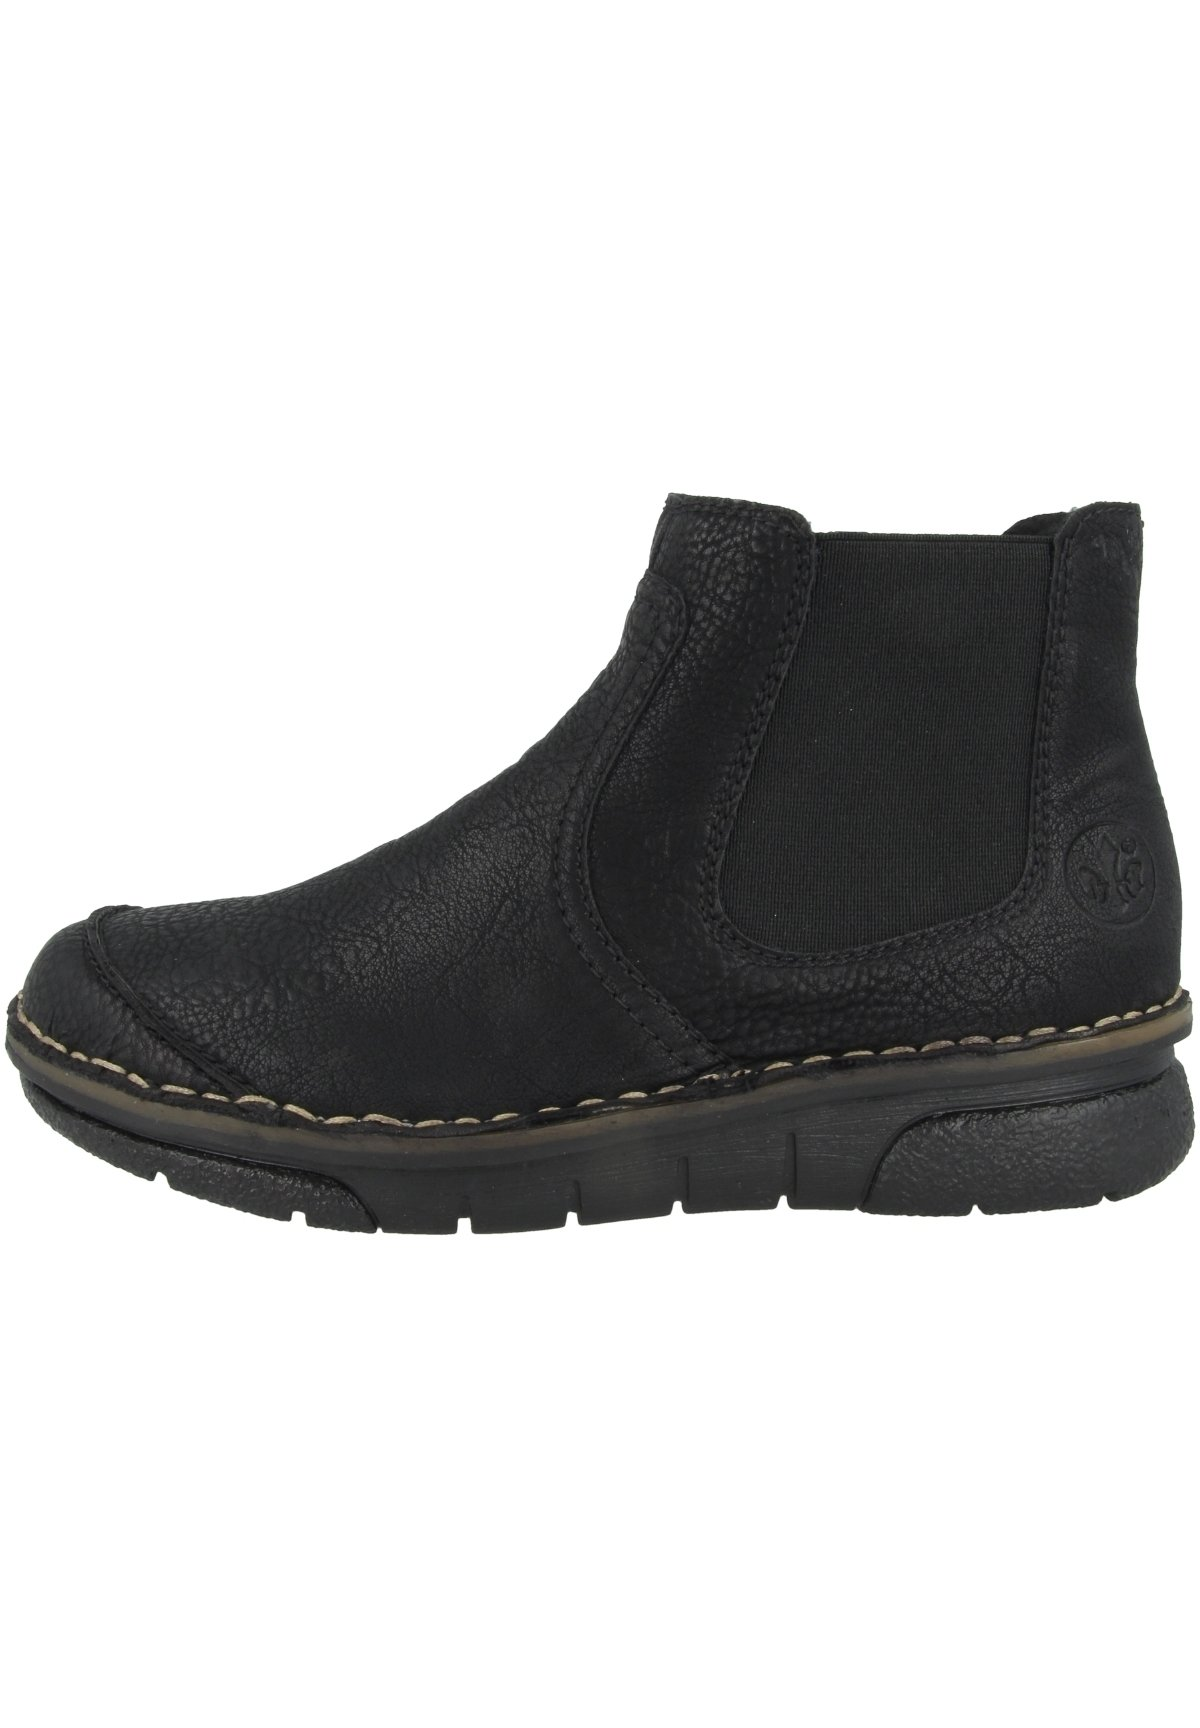 Damen Ankle Boot - black